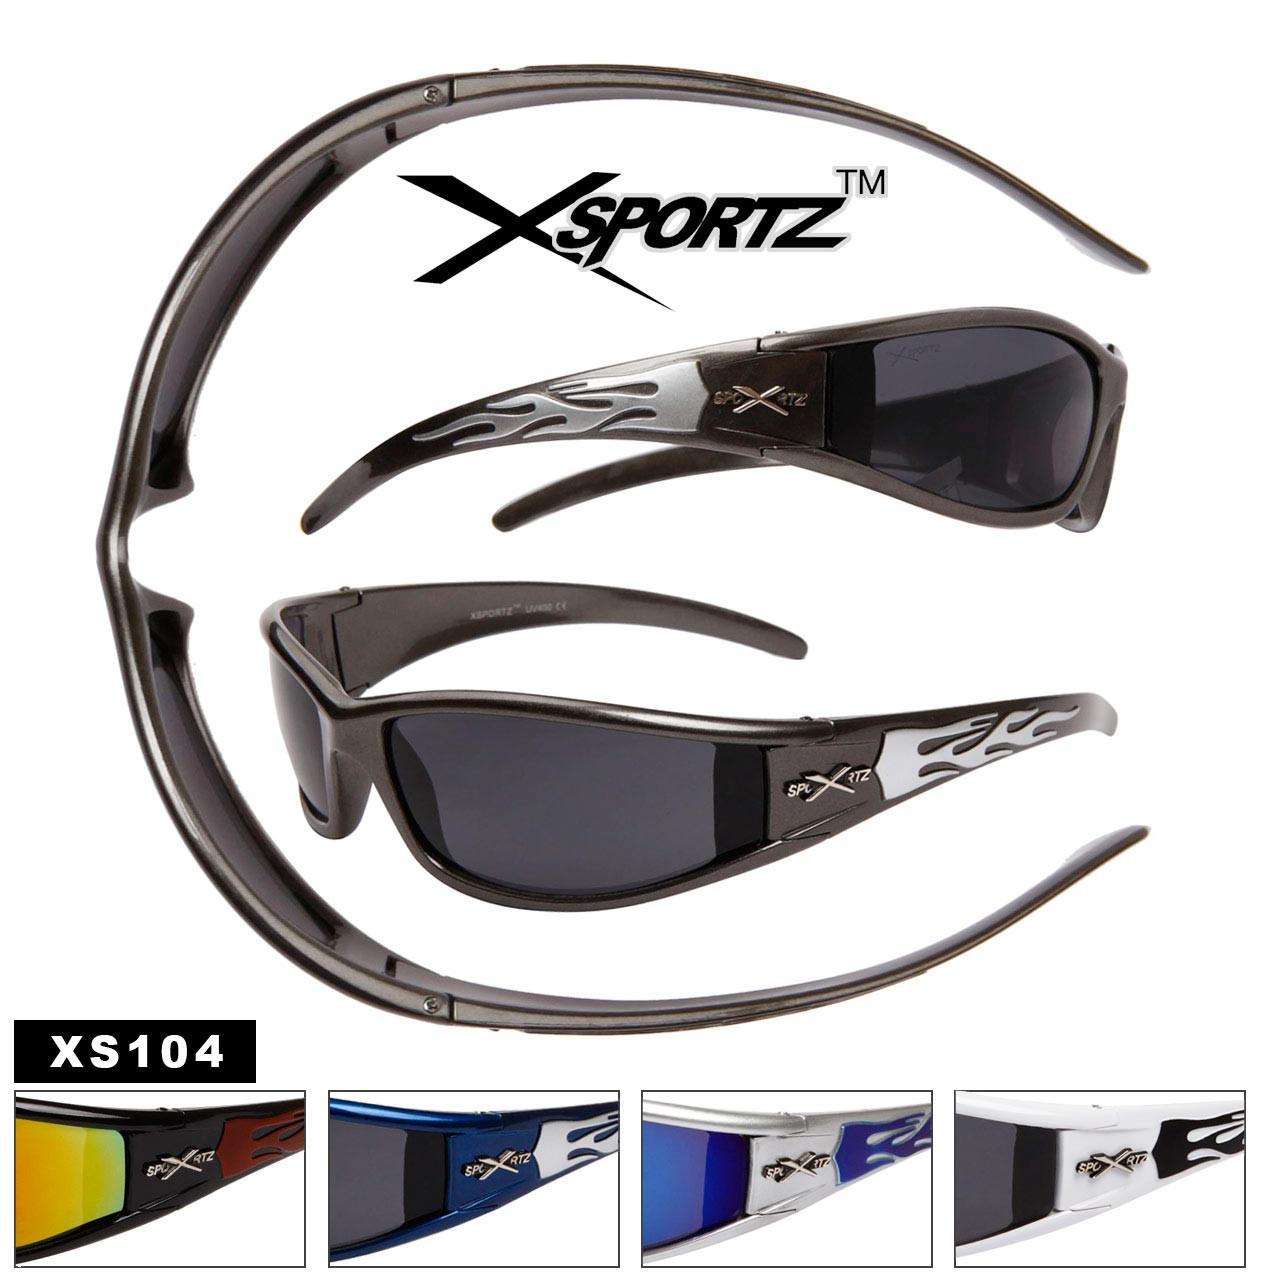 XS104 Xsportz Sunglasses